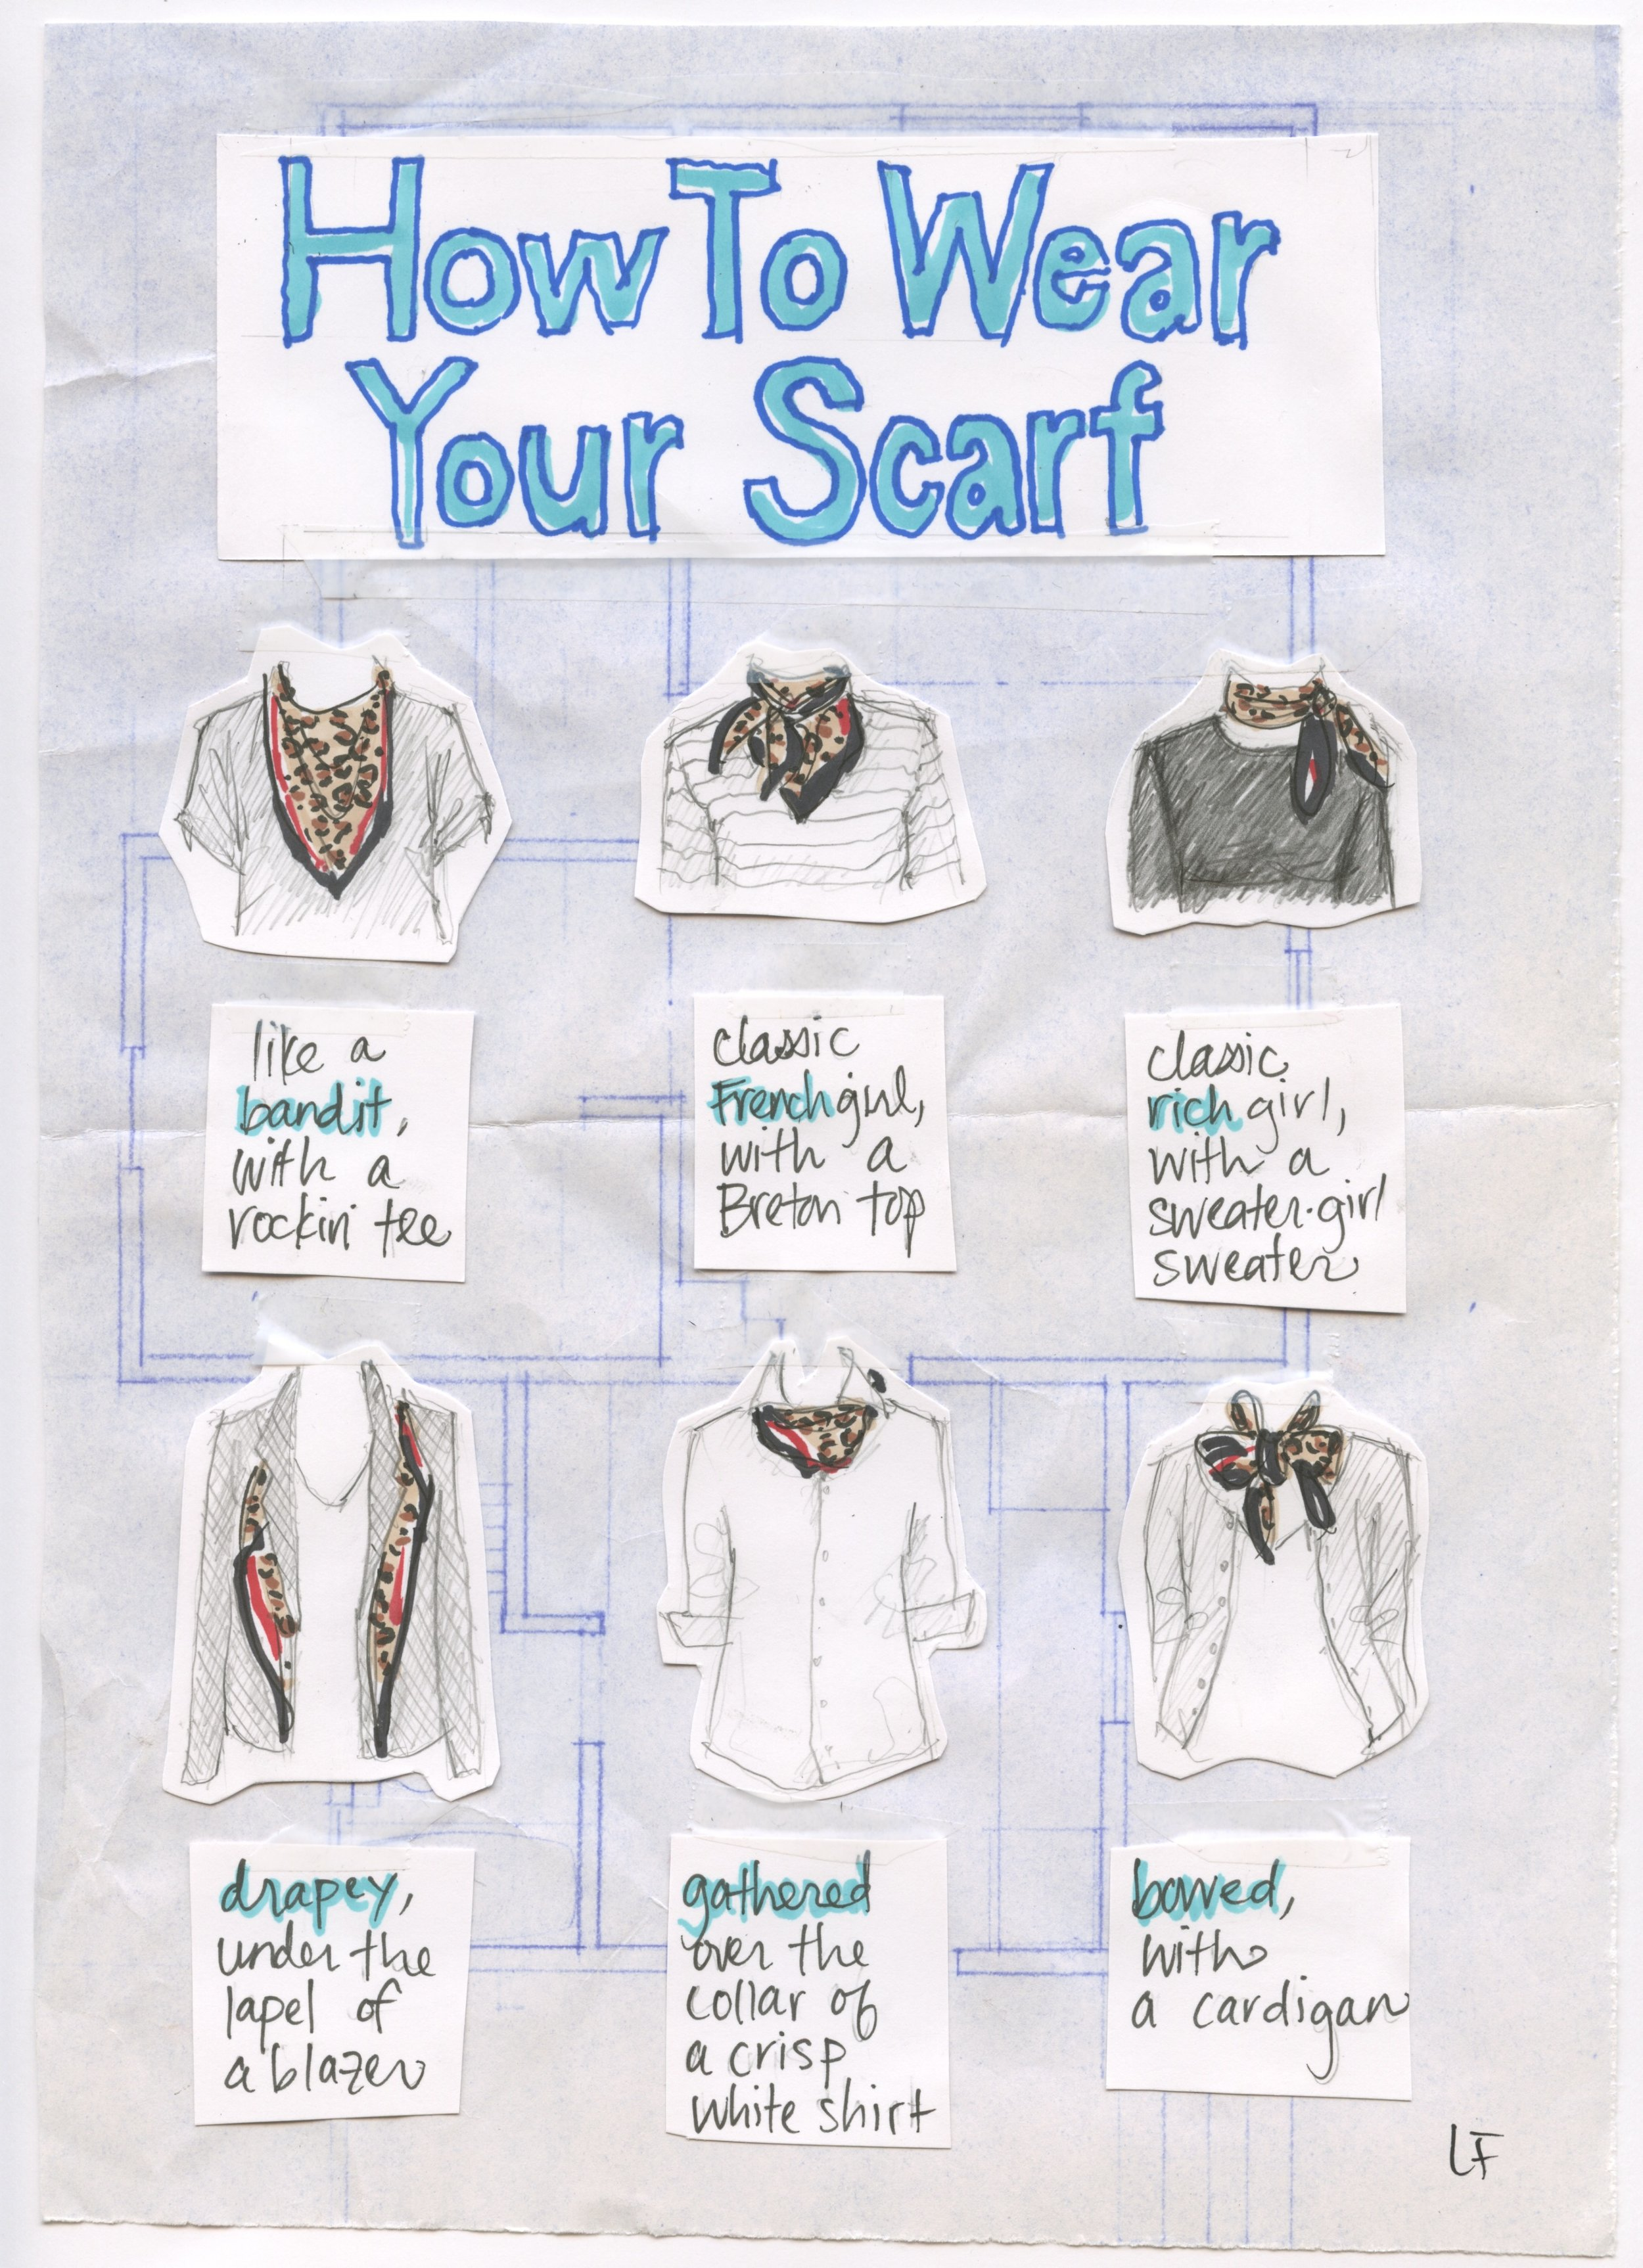 howtowearyourscarf.jpeg